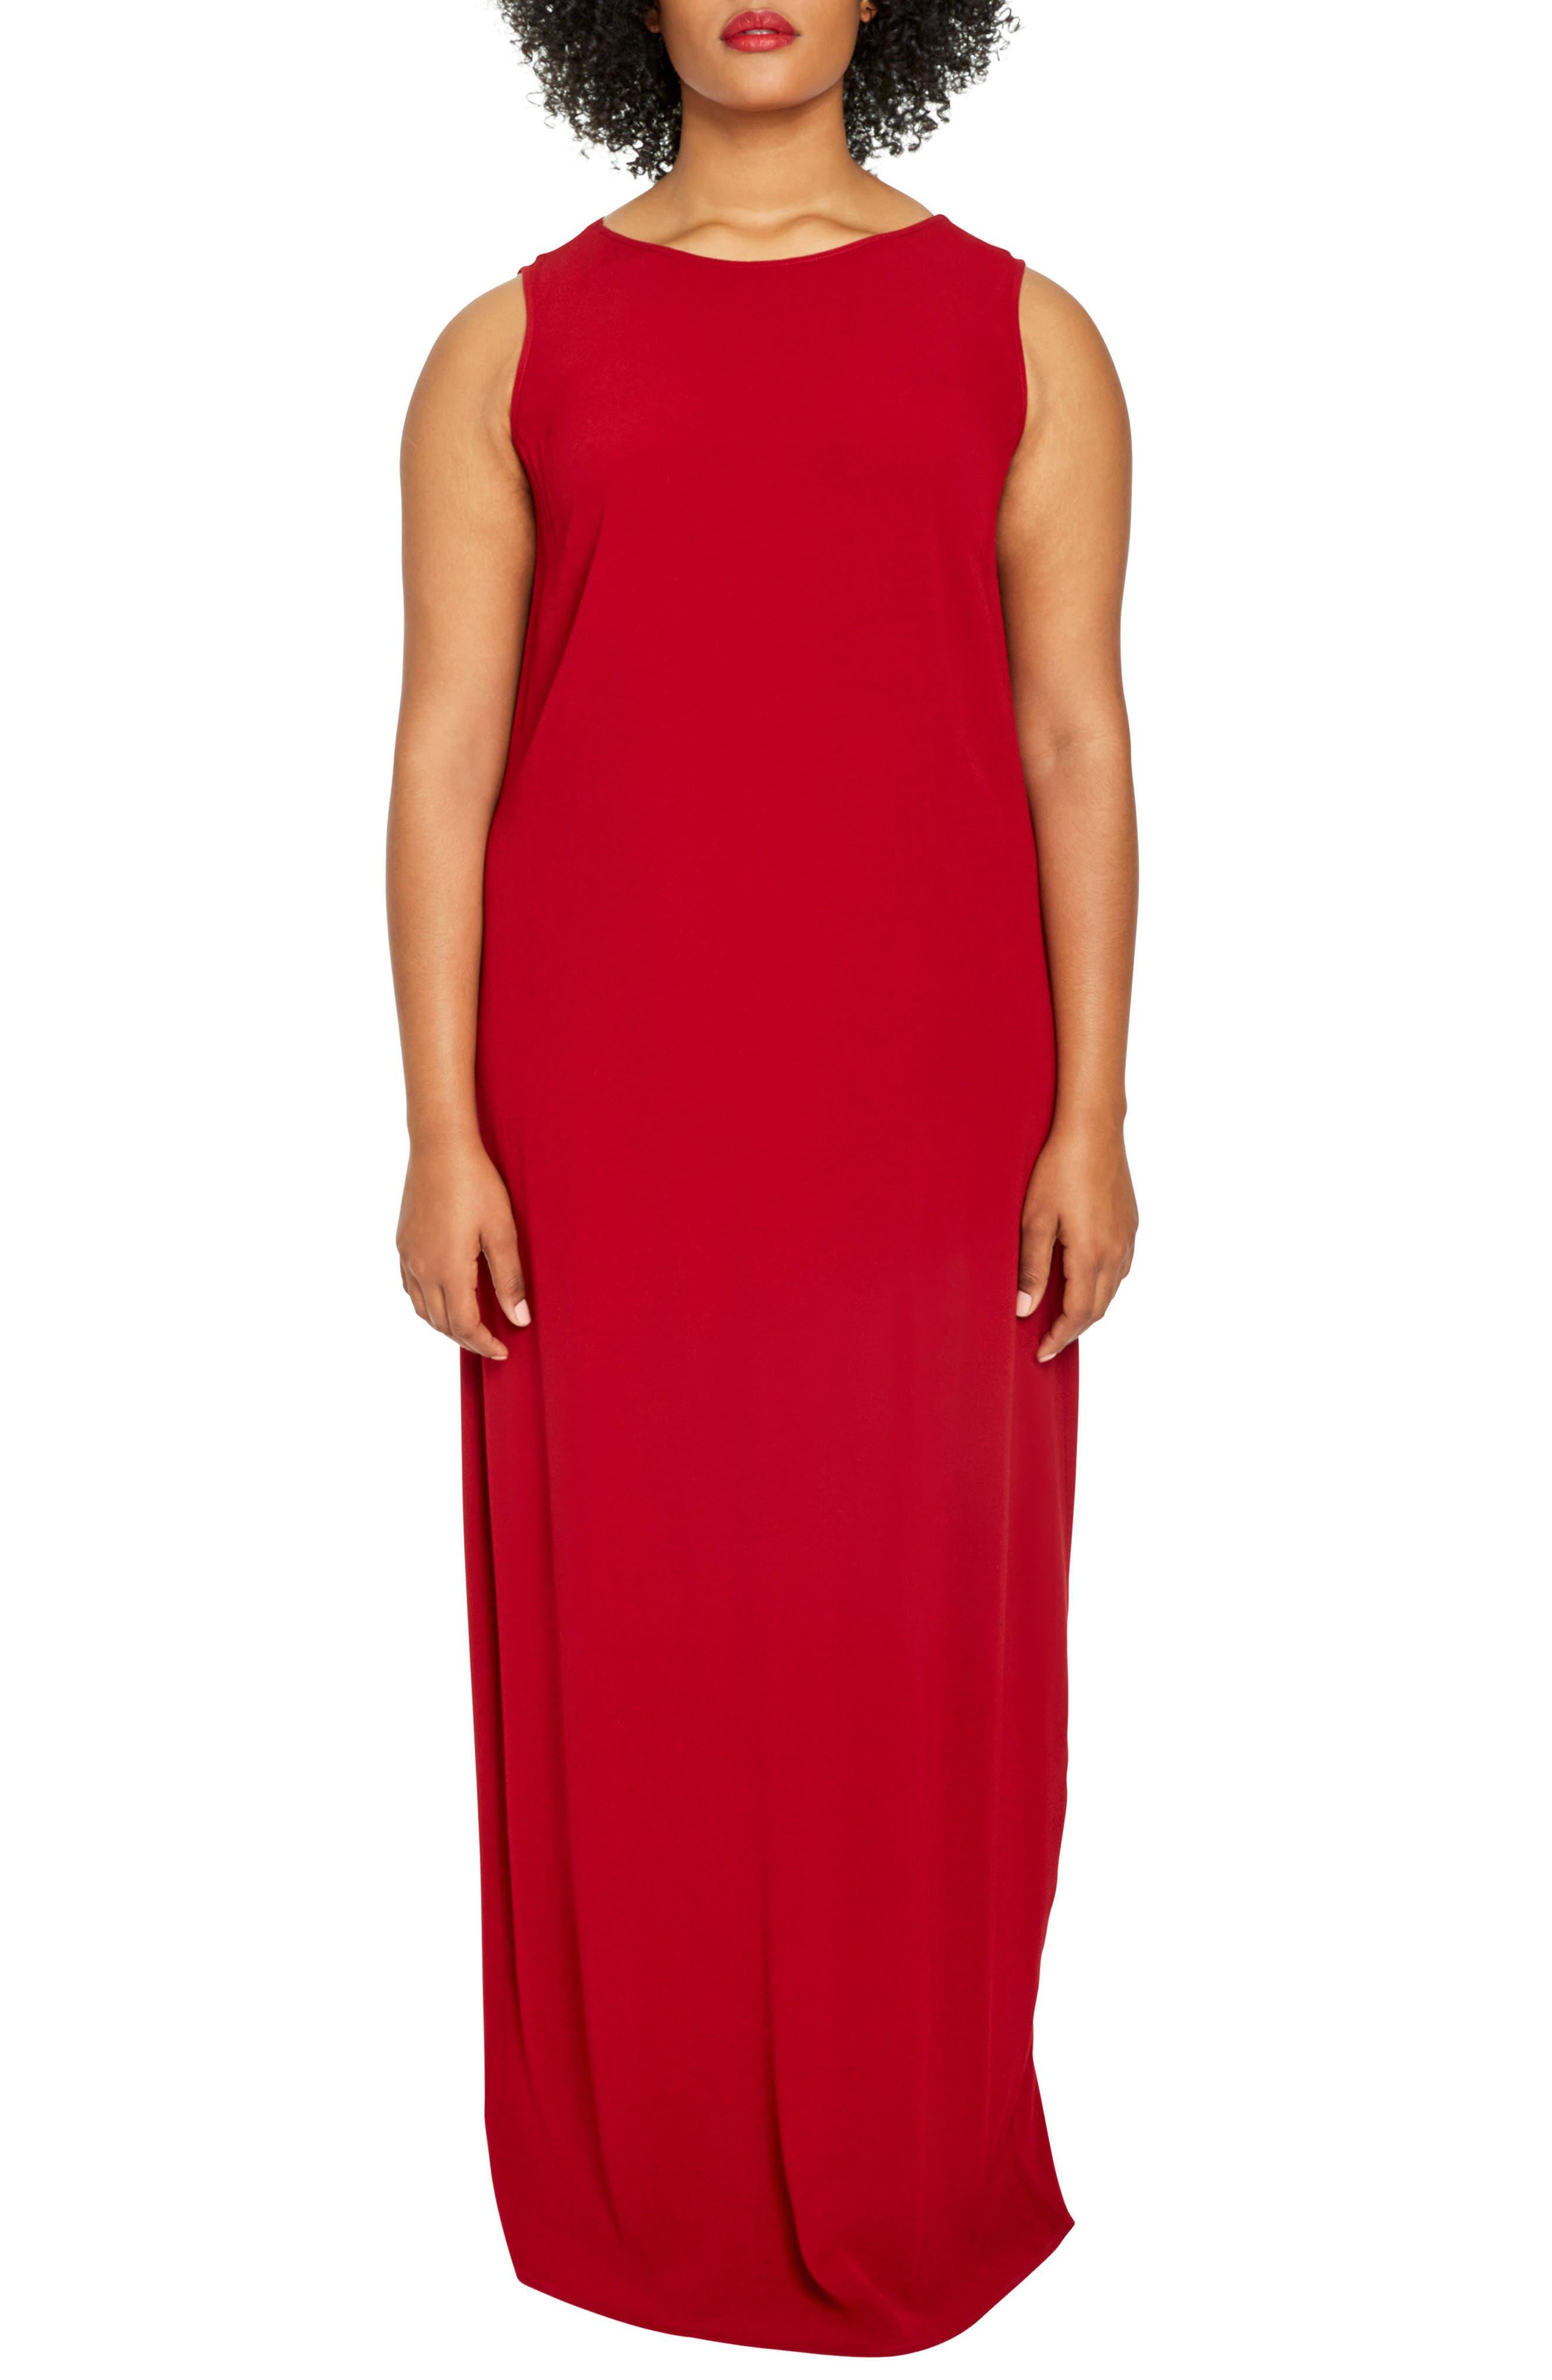 UNIVERSAL STANDARD Mera Crepe Gown (Plus Size)